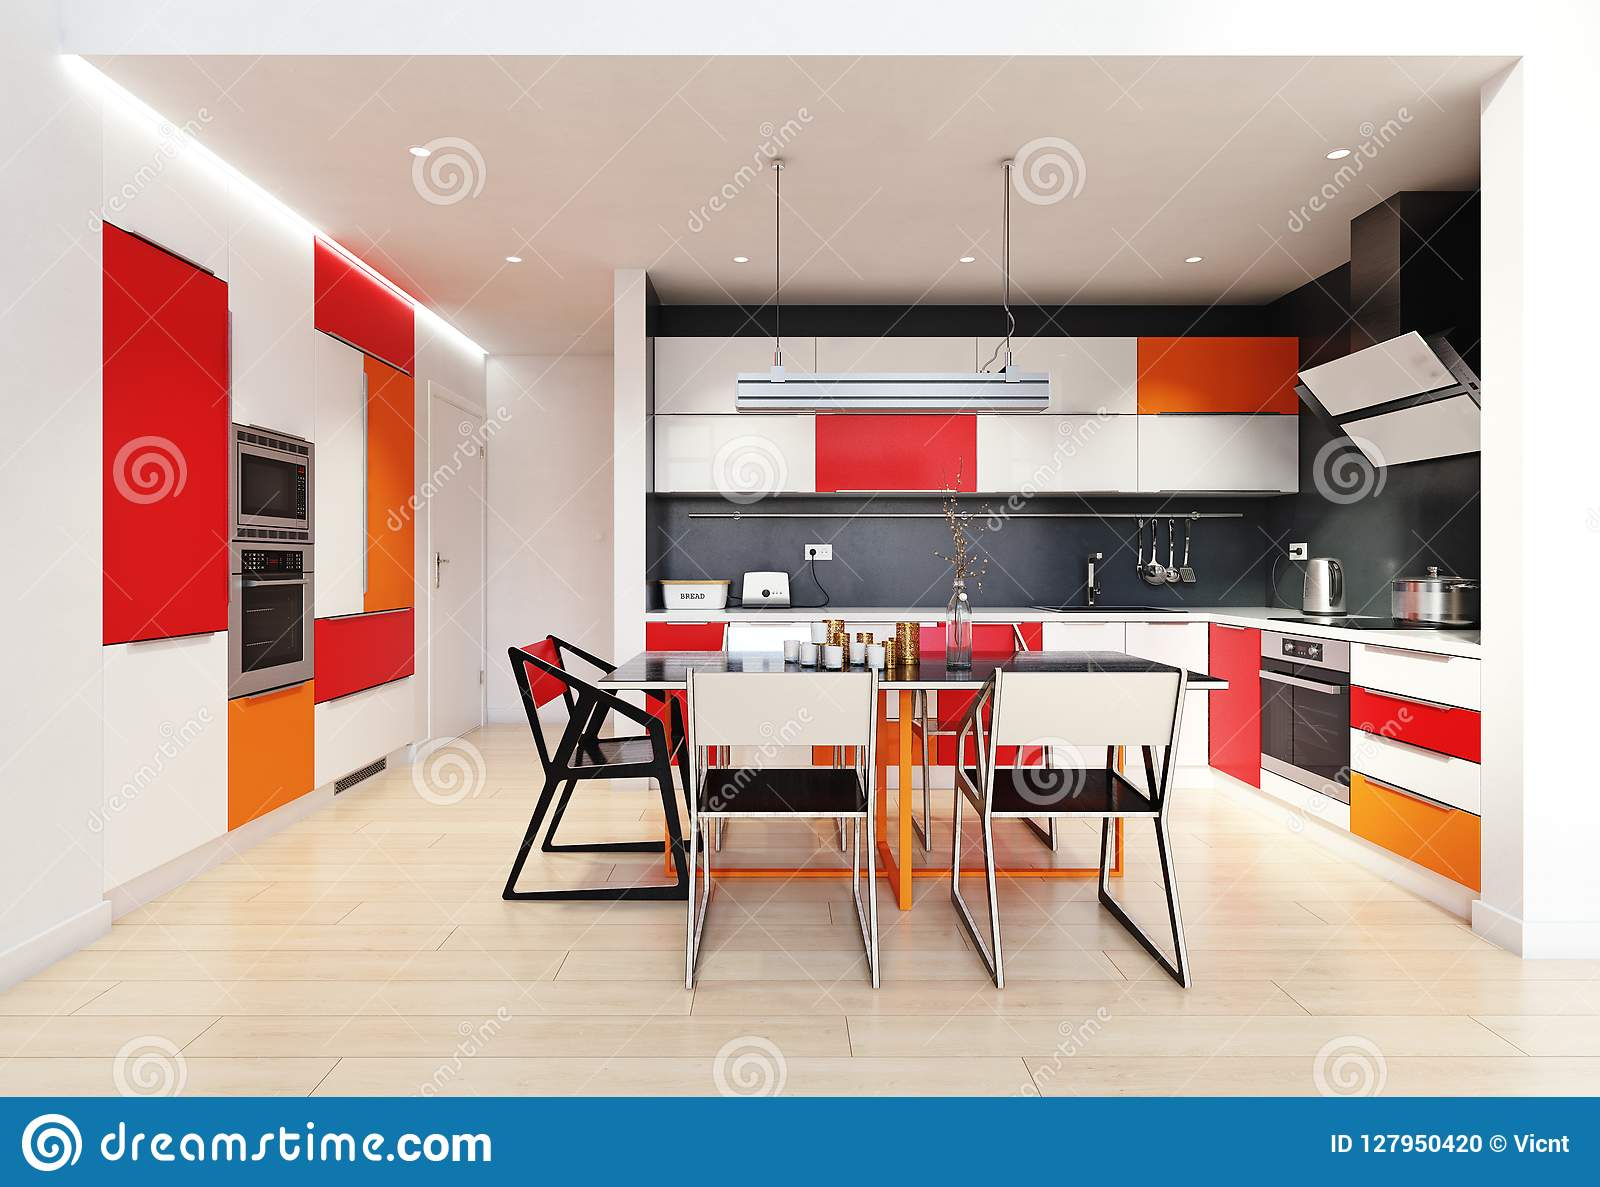 Moderner Farbkücheninnenraum